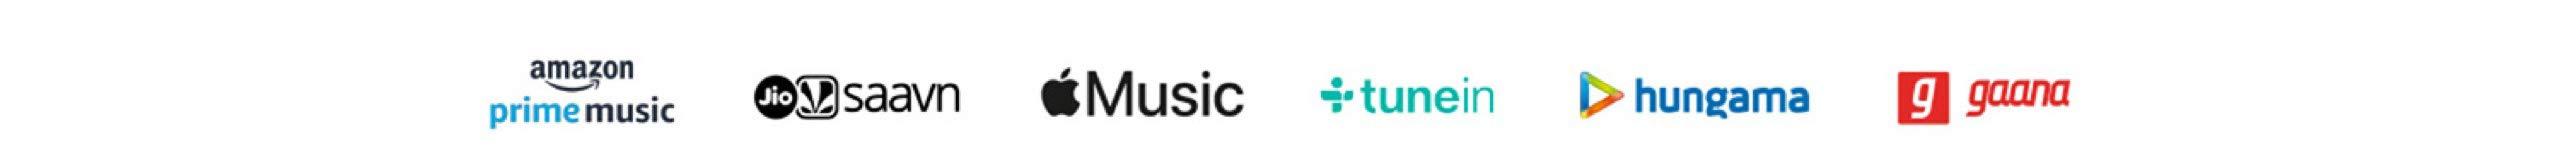 MusicLogs